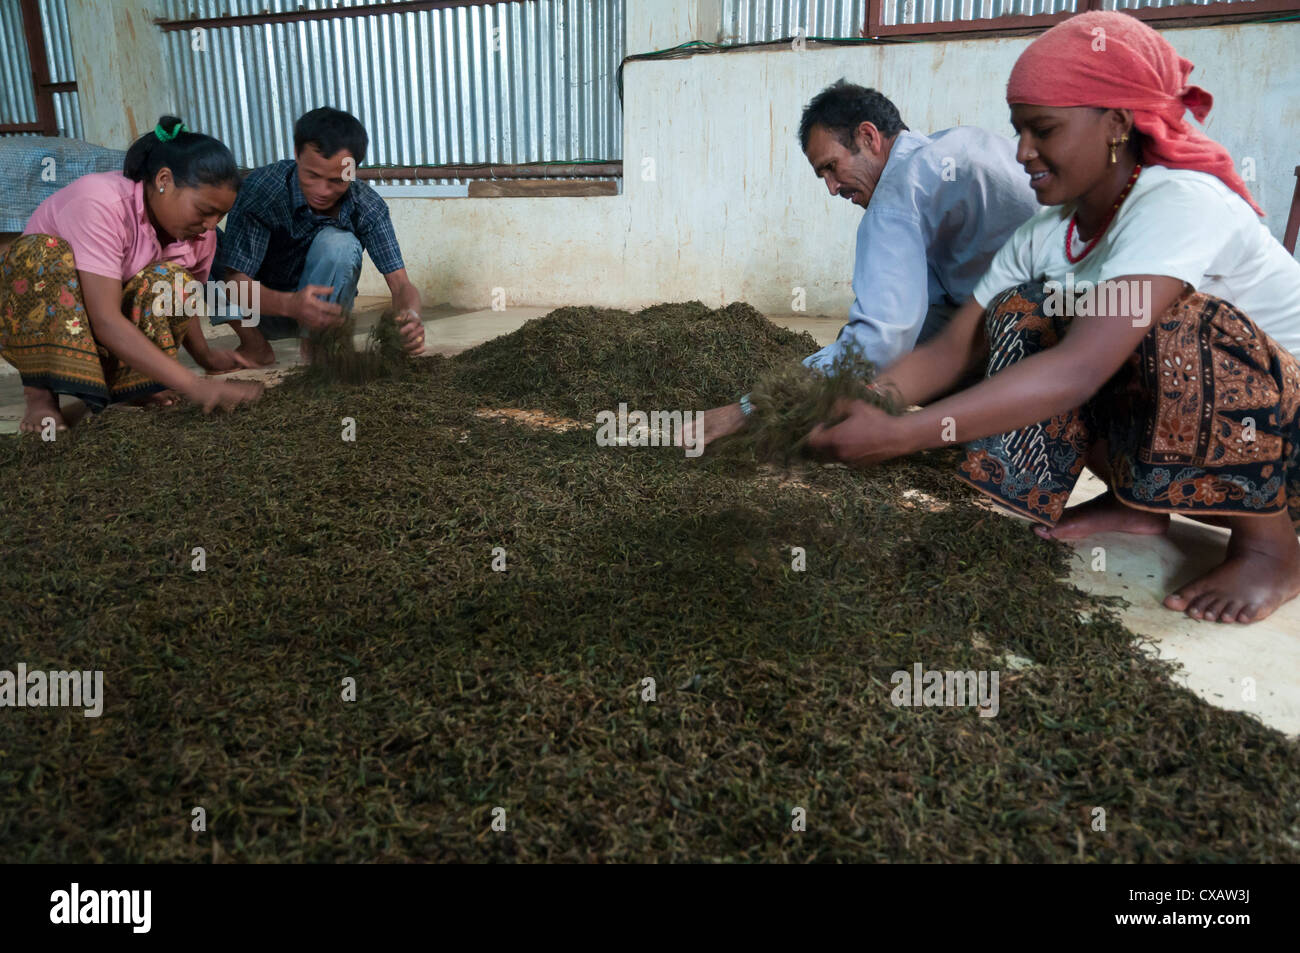 Lwan Tea factory, Pokhara, Annapurna region, Nepal, Asia Stock Photo